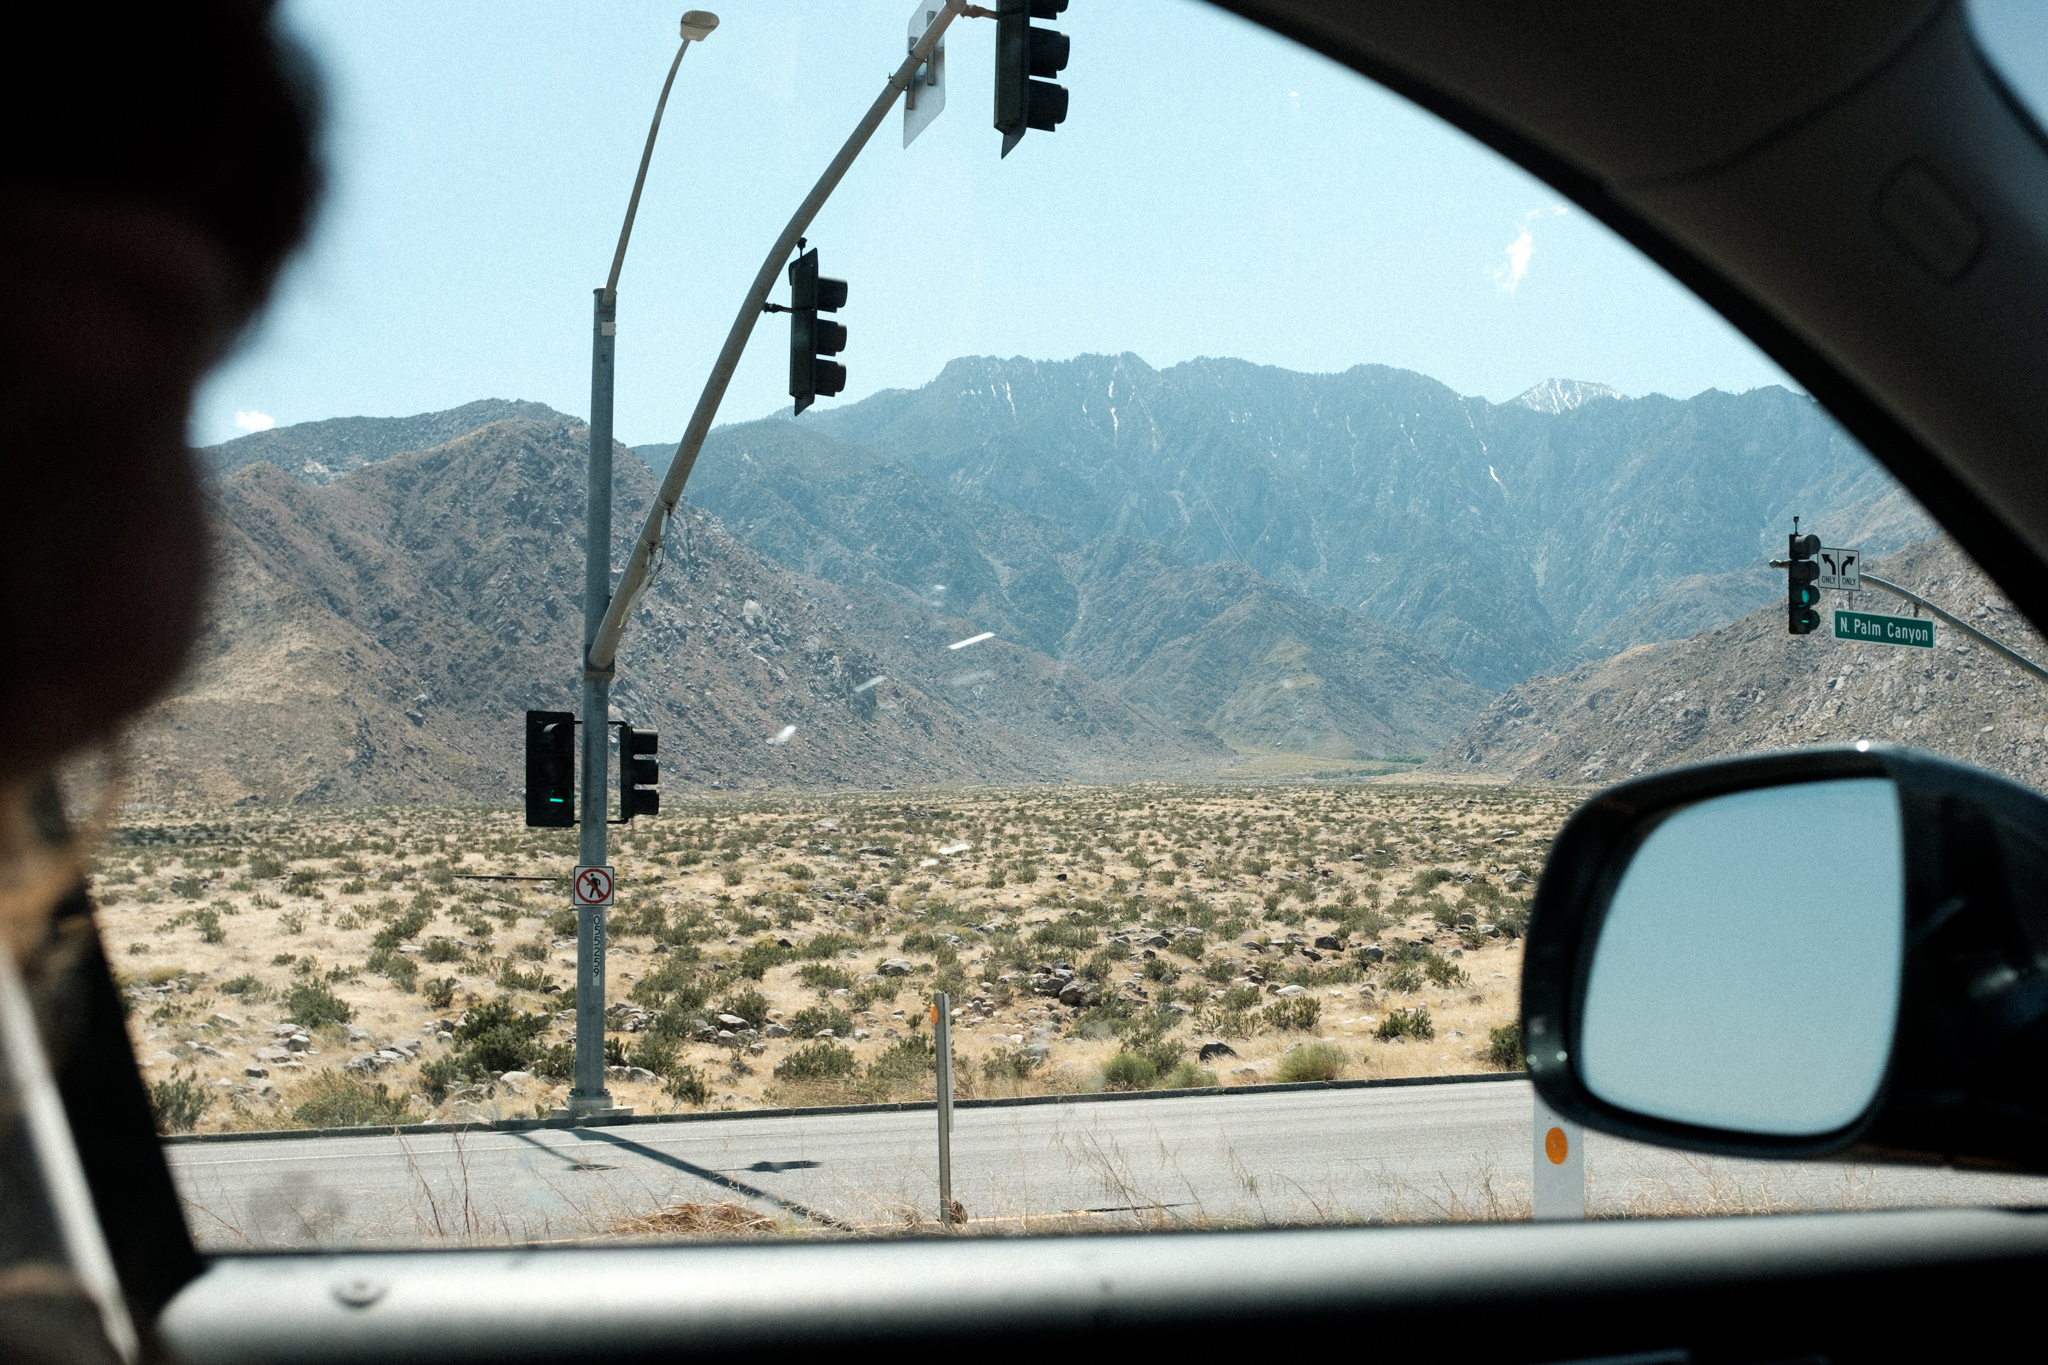 170418 Coachella 17 w1 1511.jpg